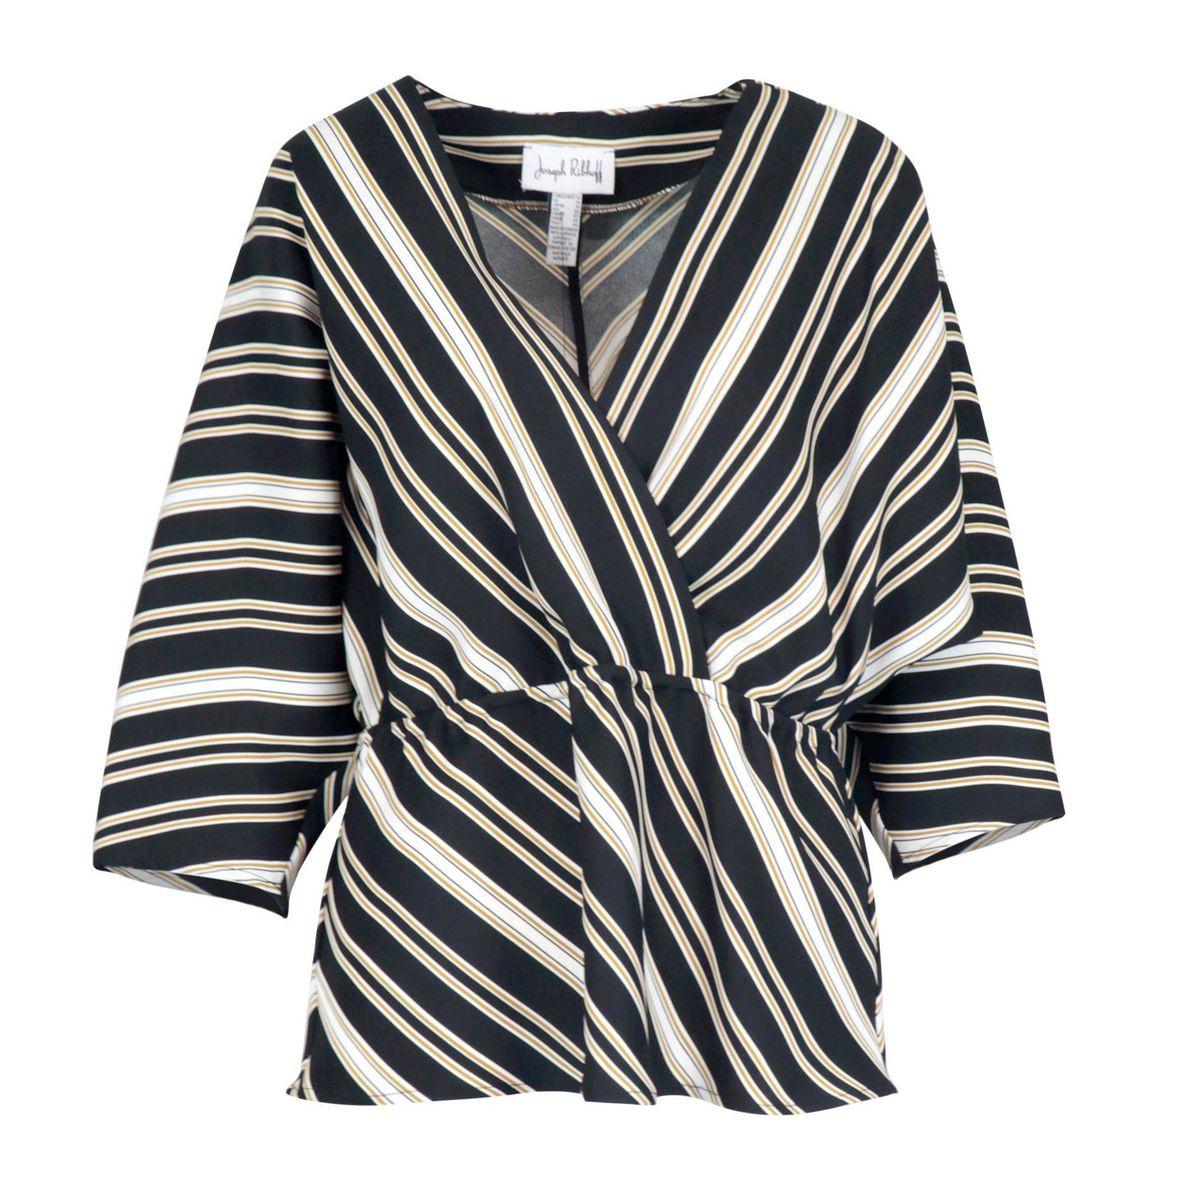 Polyester sweater with cross neckline Black / beige Joseph Ribkoff